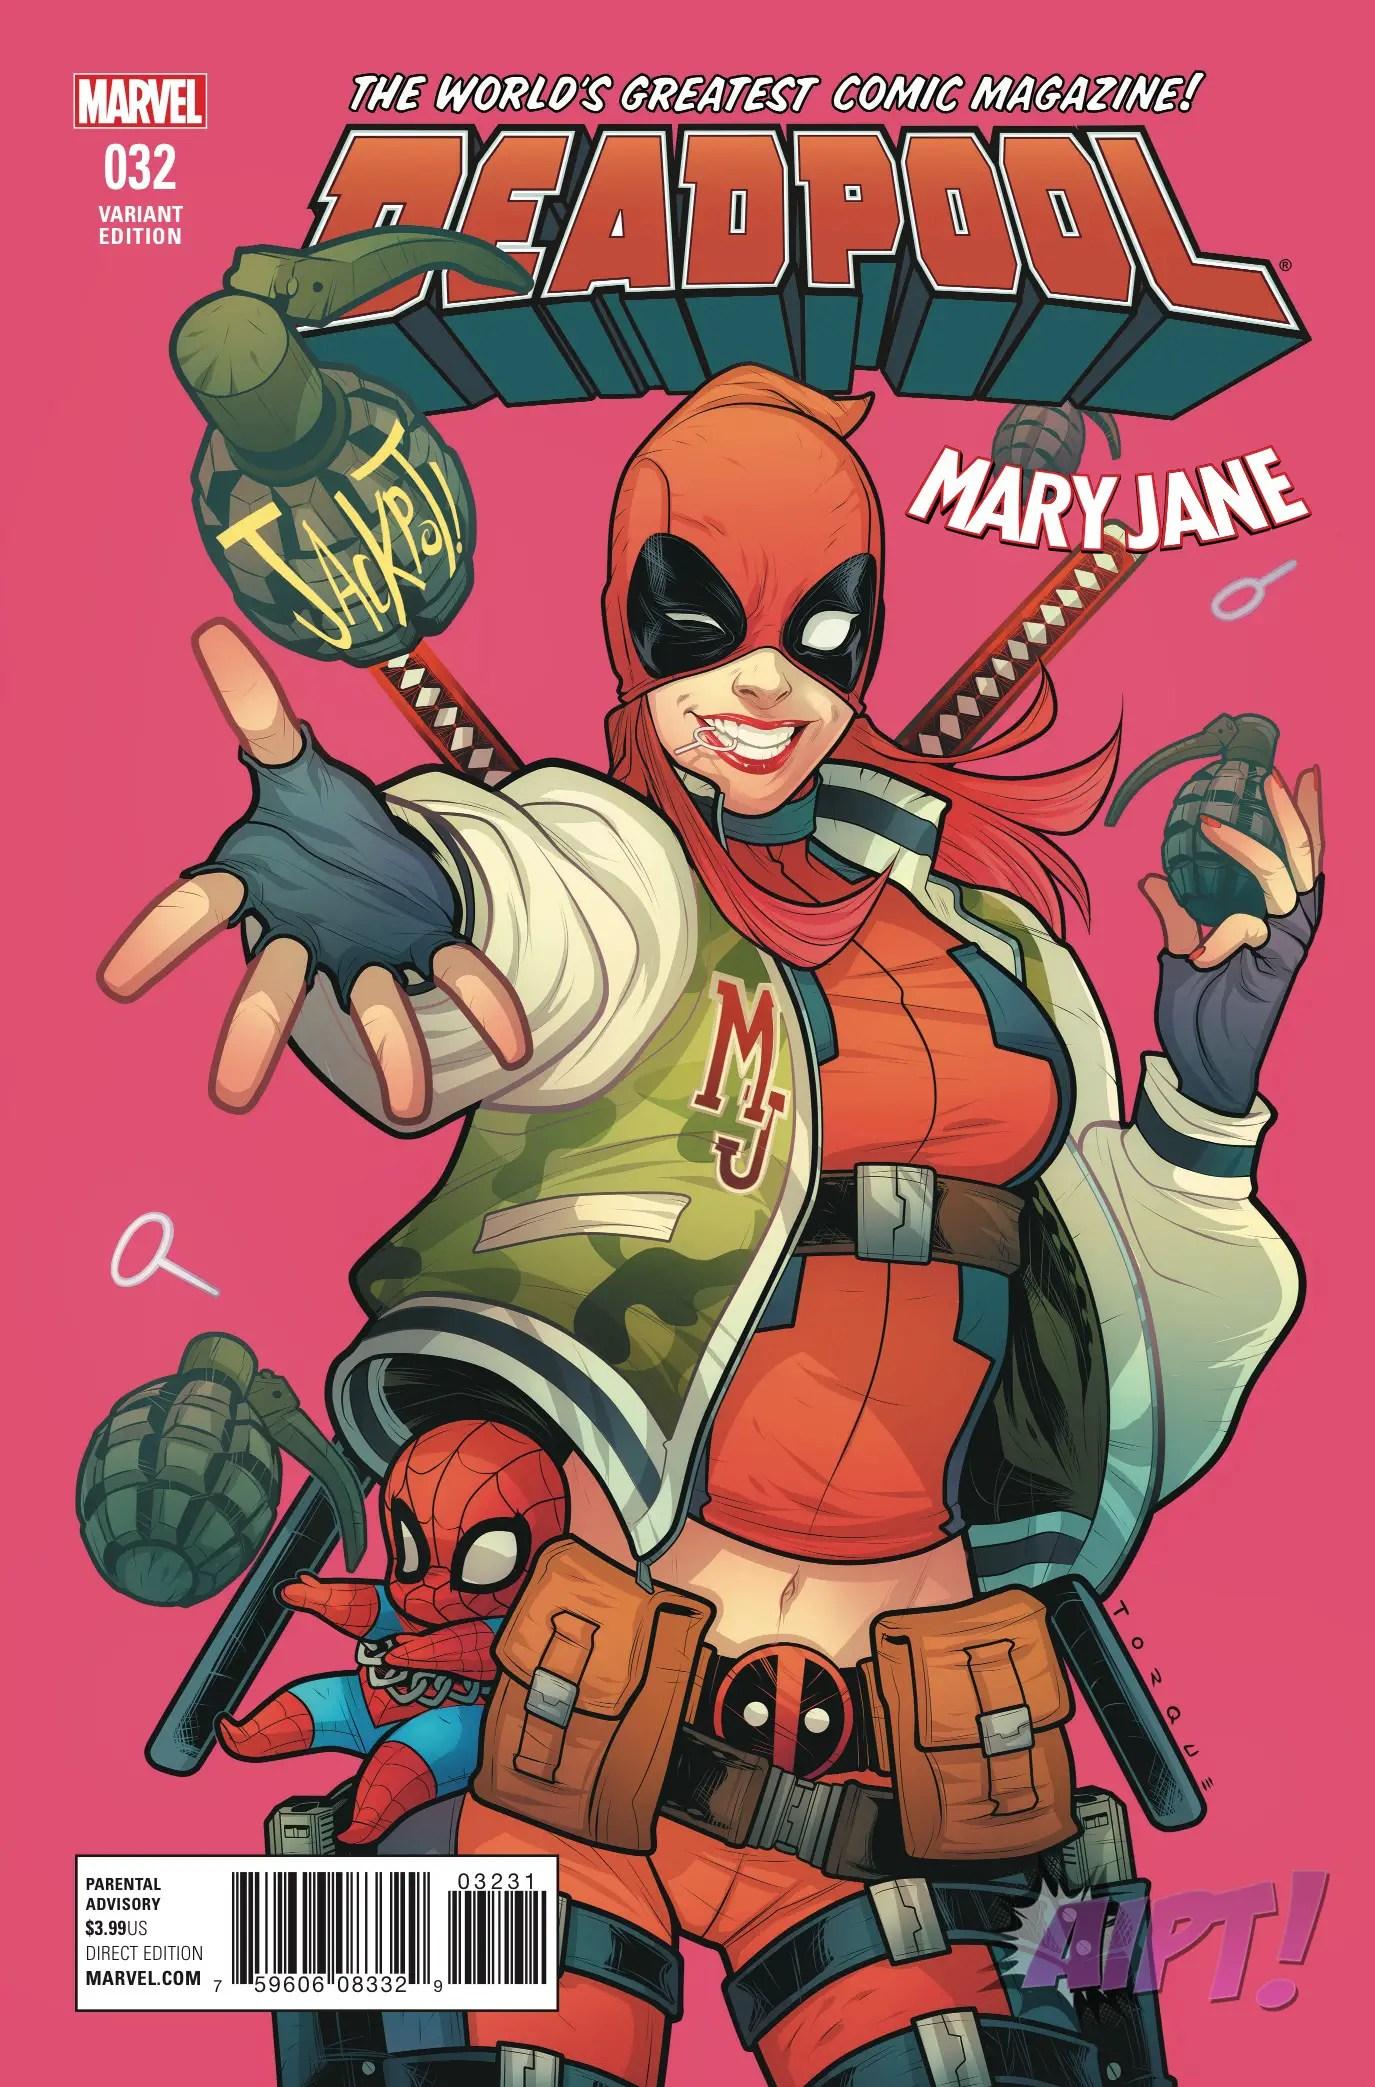 Deadpool #32 Review